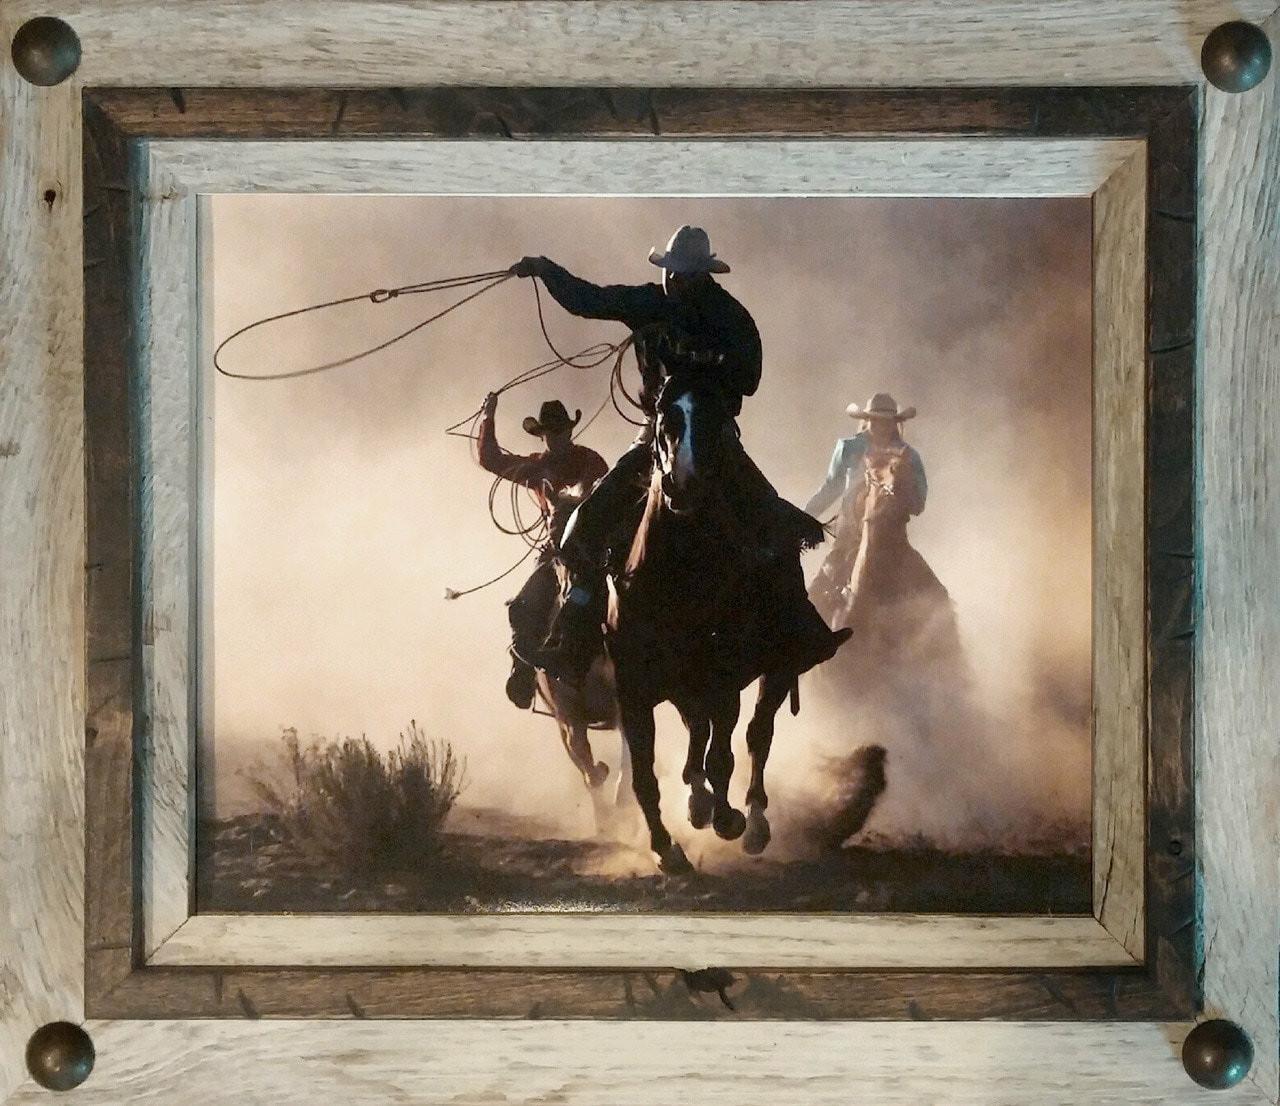 Rustic Frames | Reclaimed Barnwood Frame with Large Metal Tacks 8x10